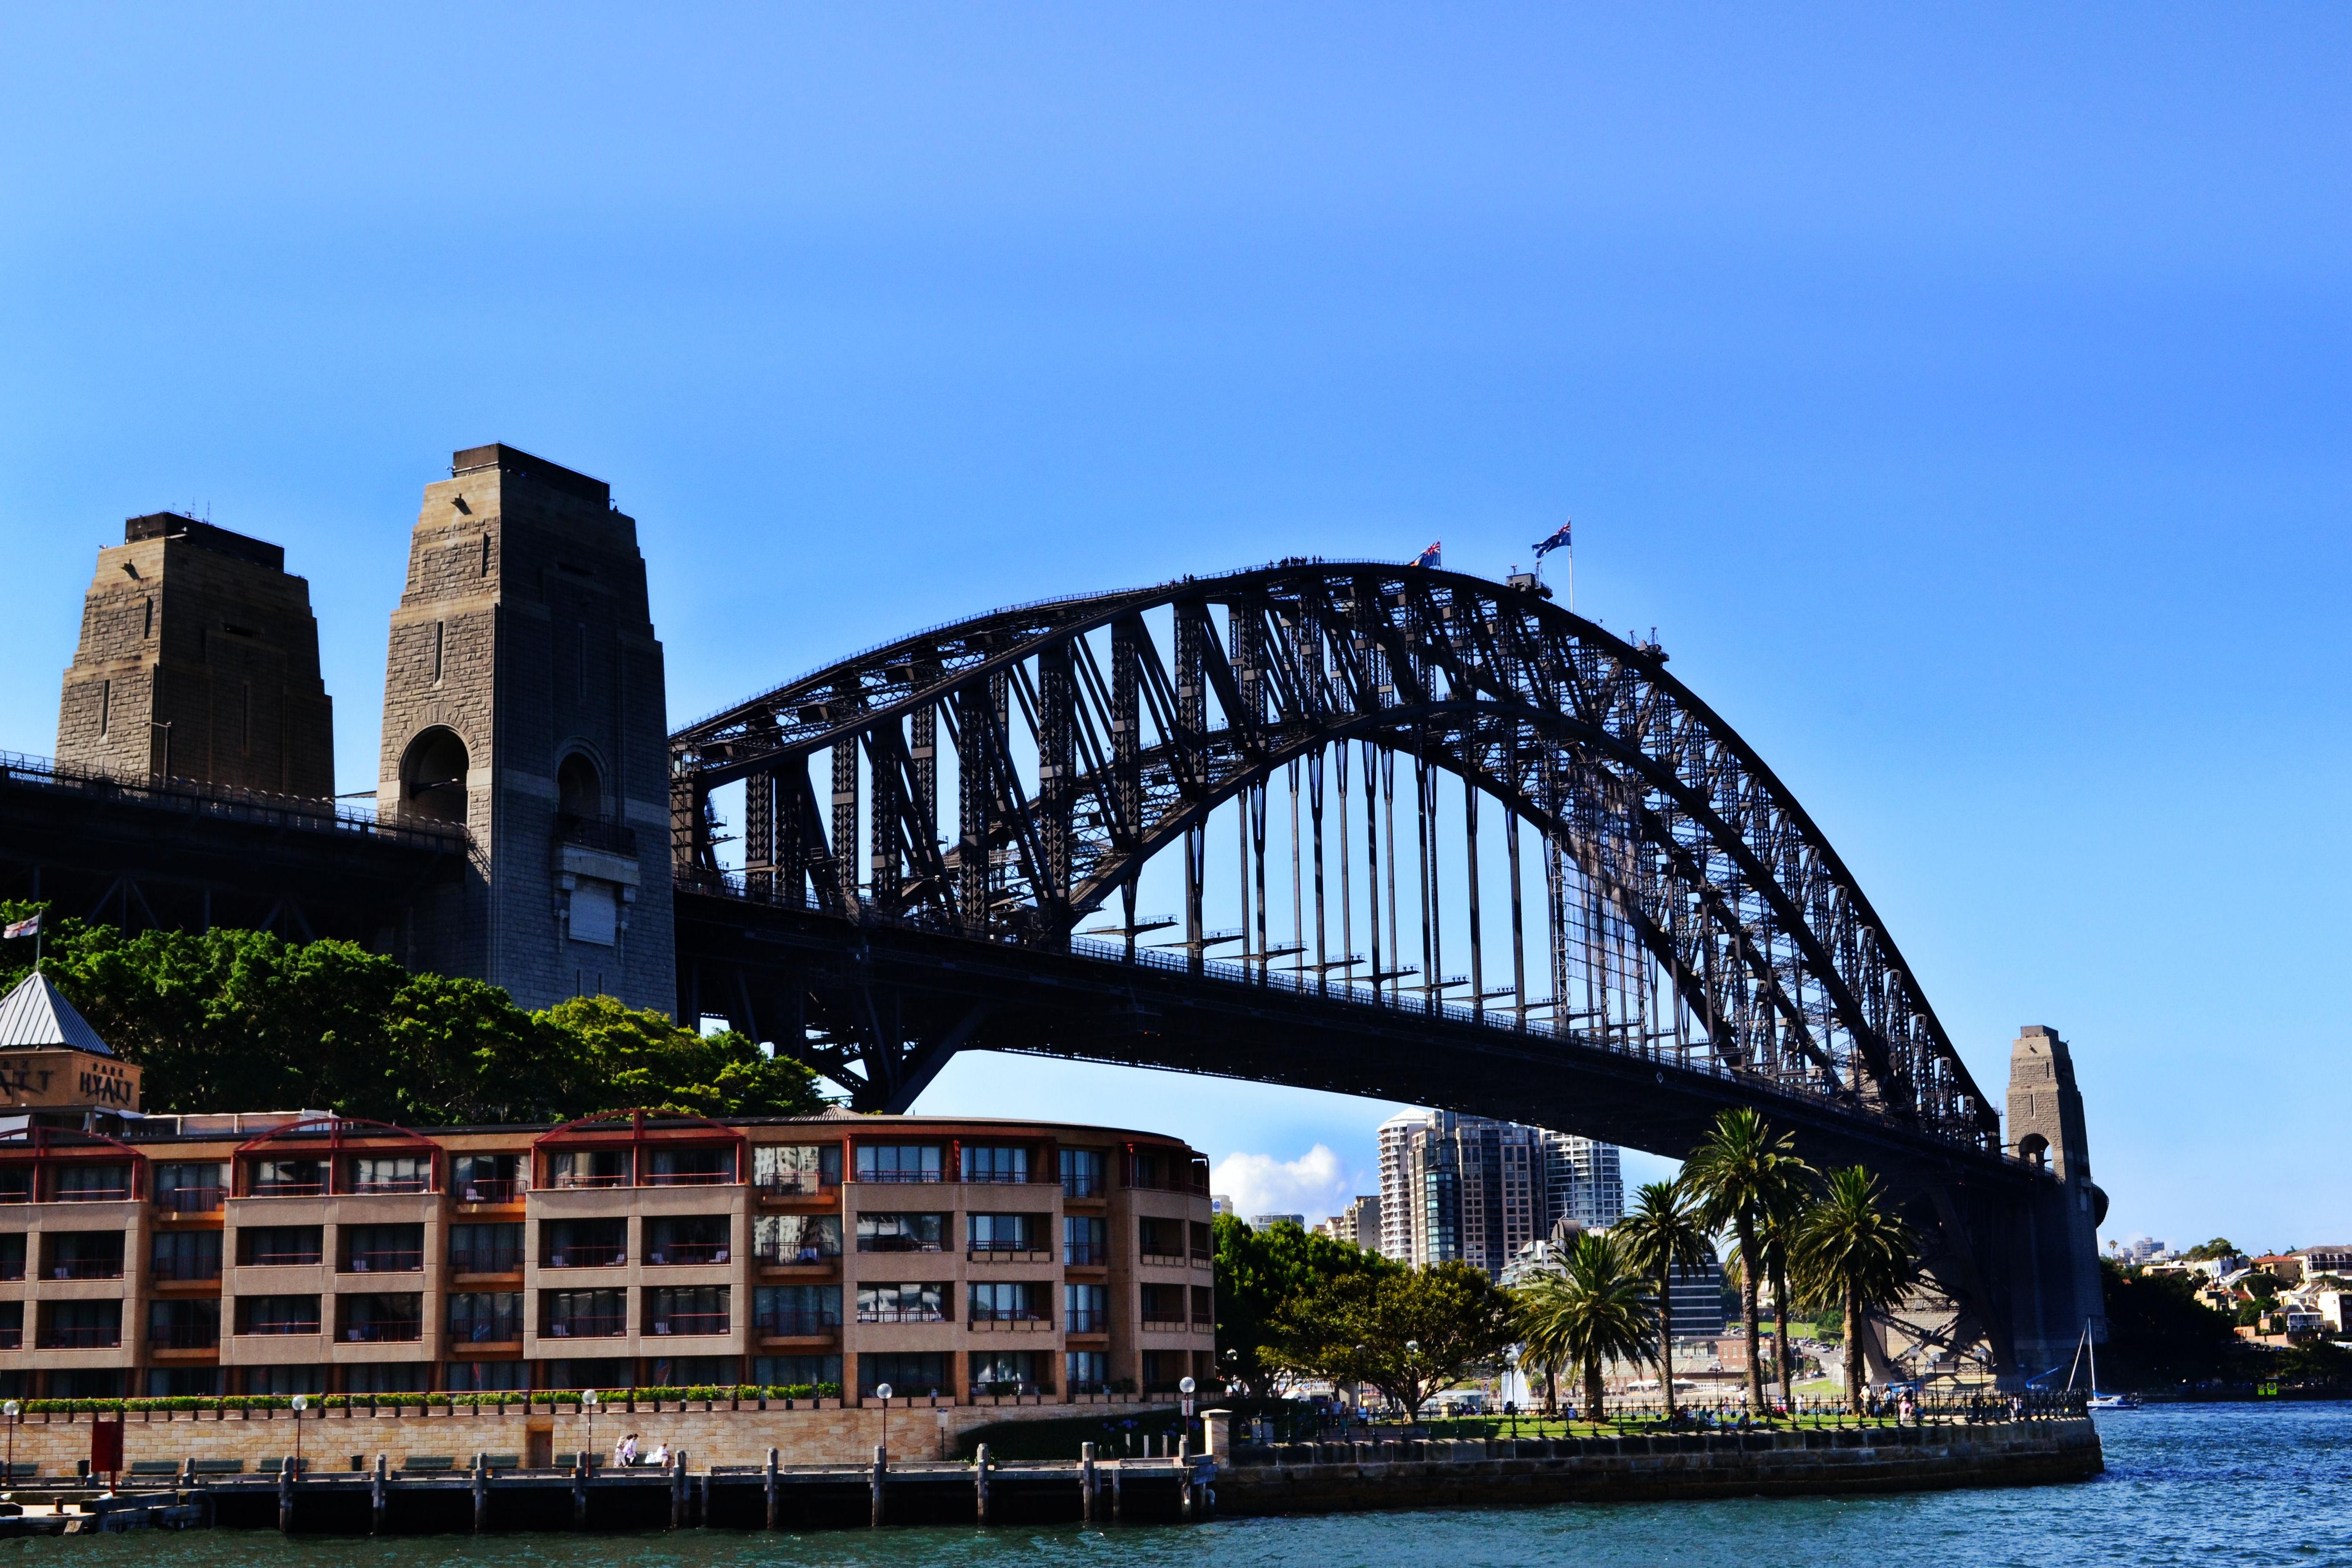 Sydney Harbour Bridge 4k Ultra Hd Wallpaper Background Image